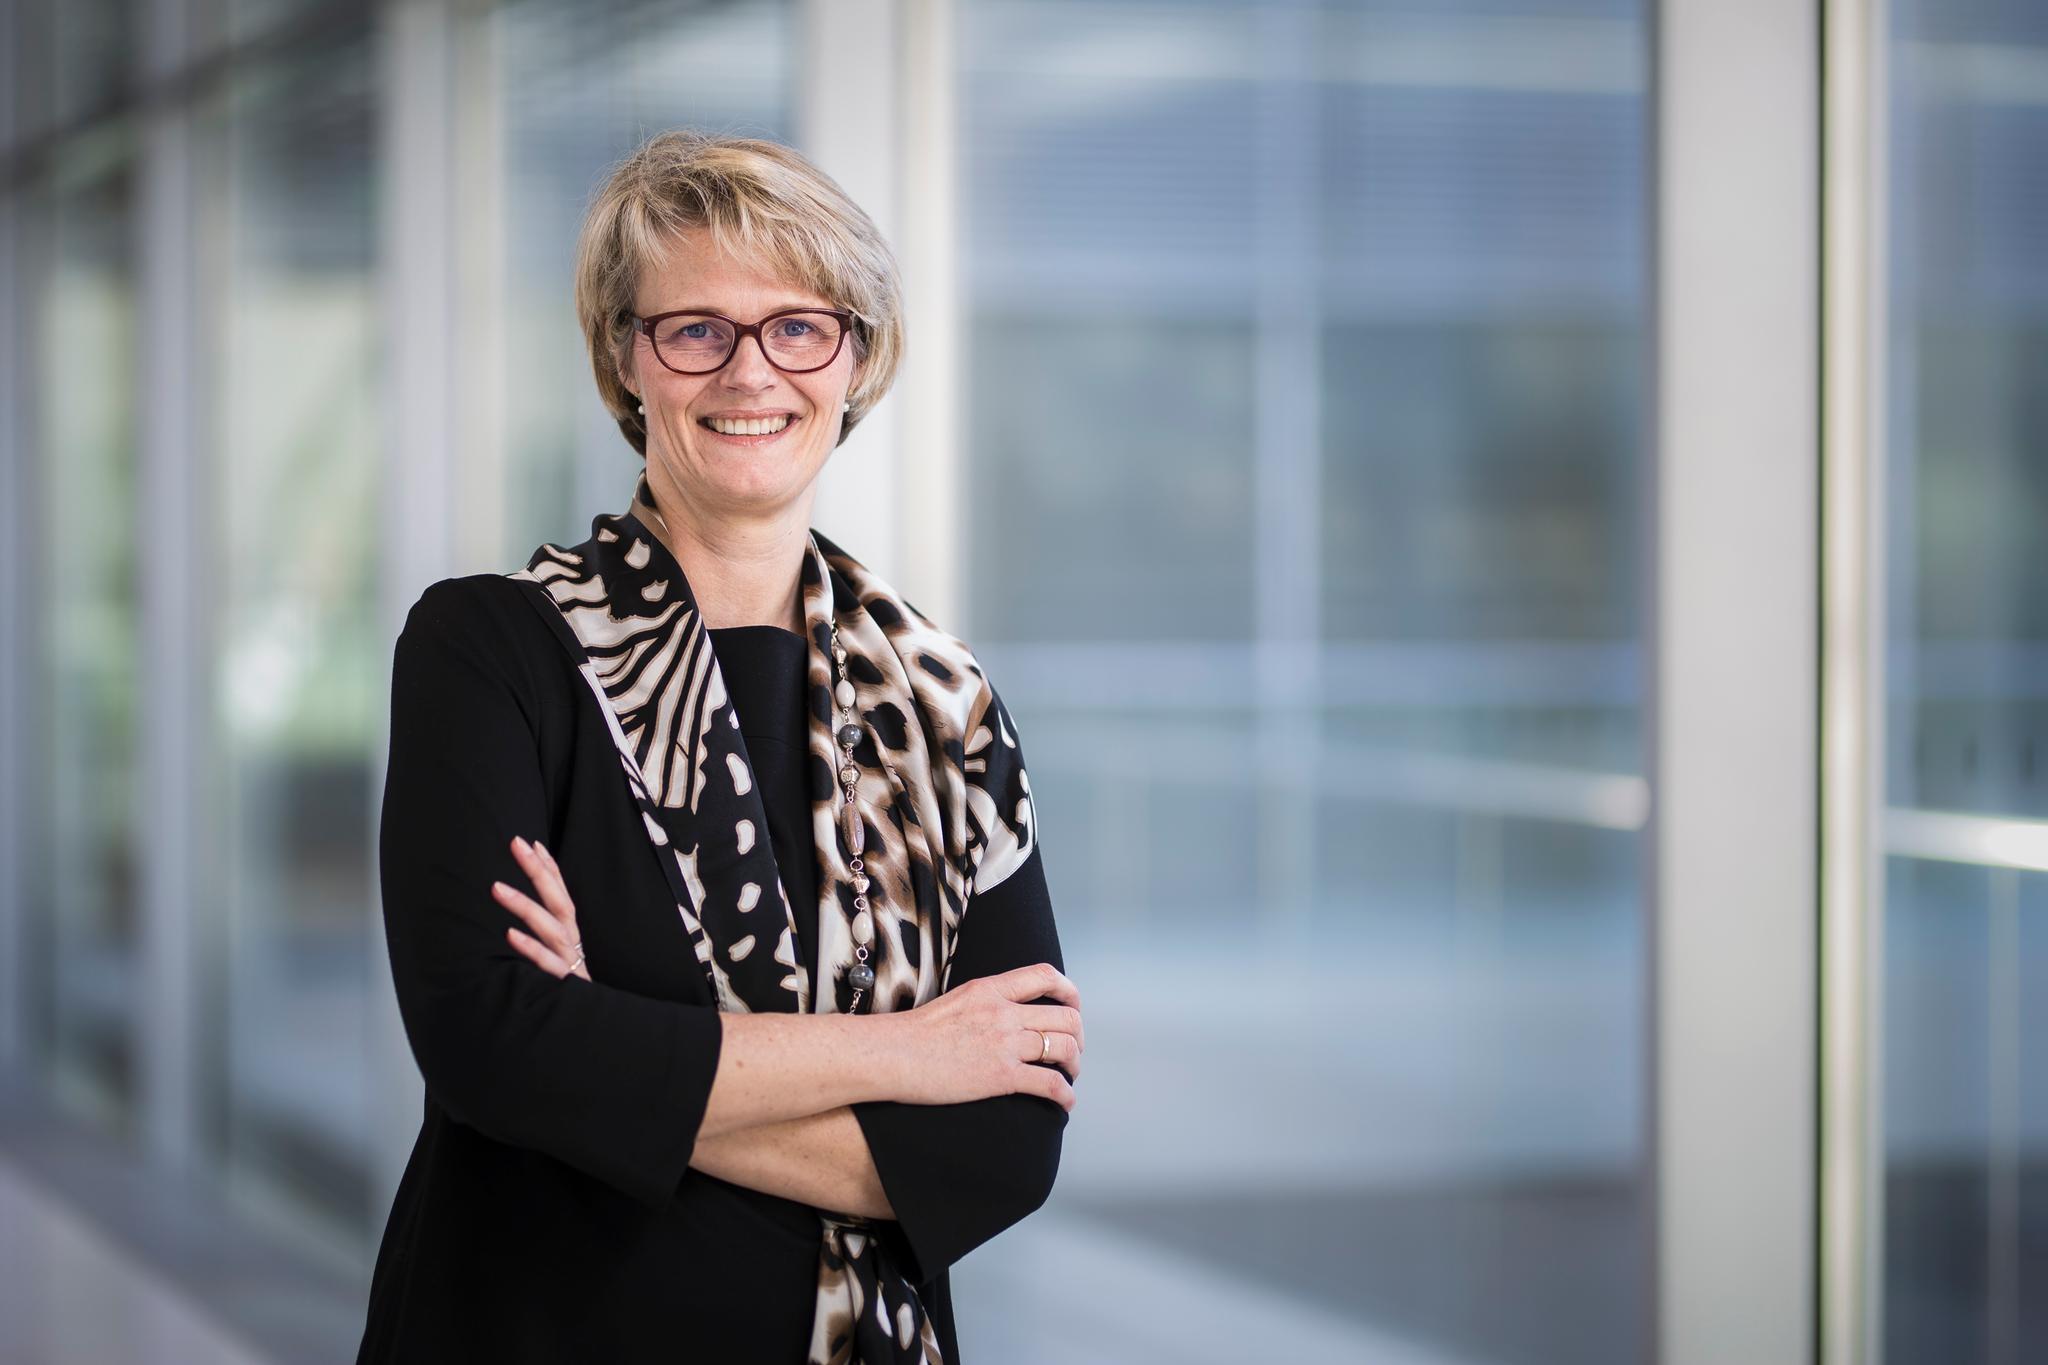 Die neue Bildungsministerin Anja Karliczek